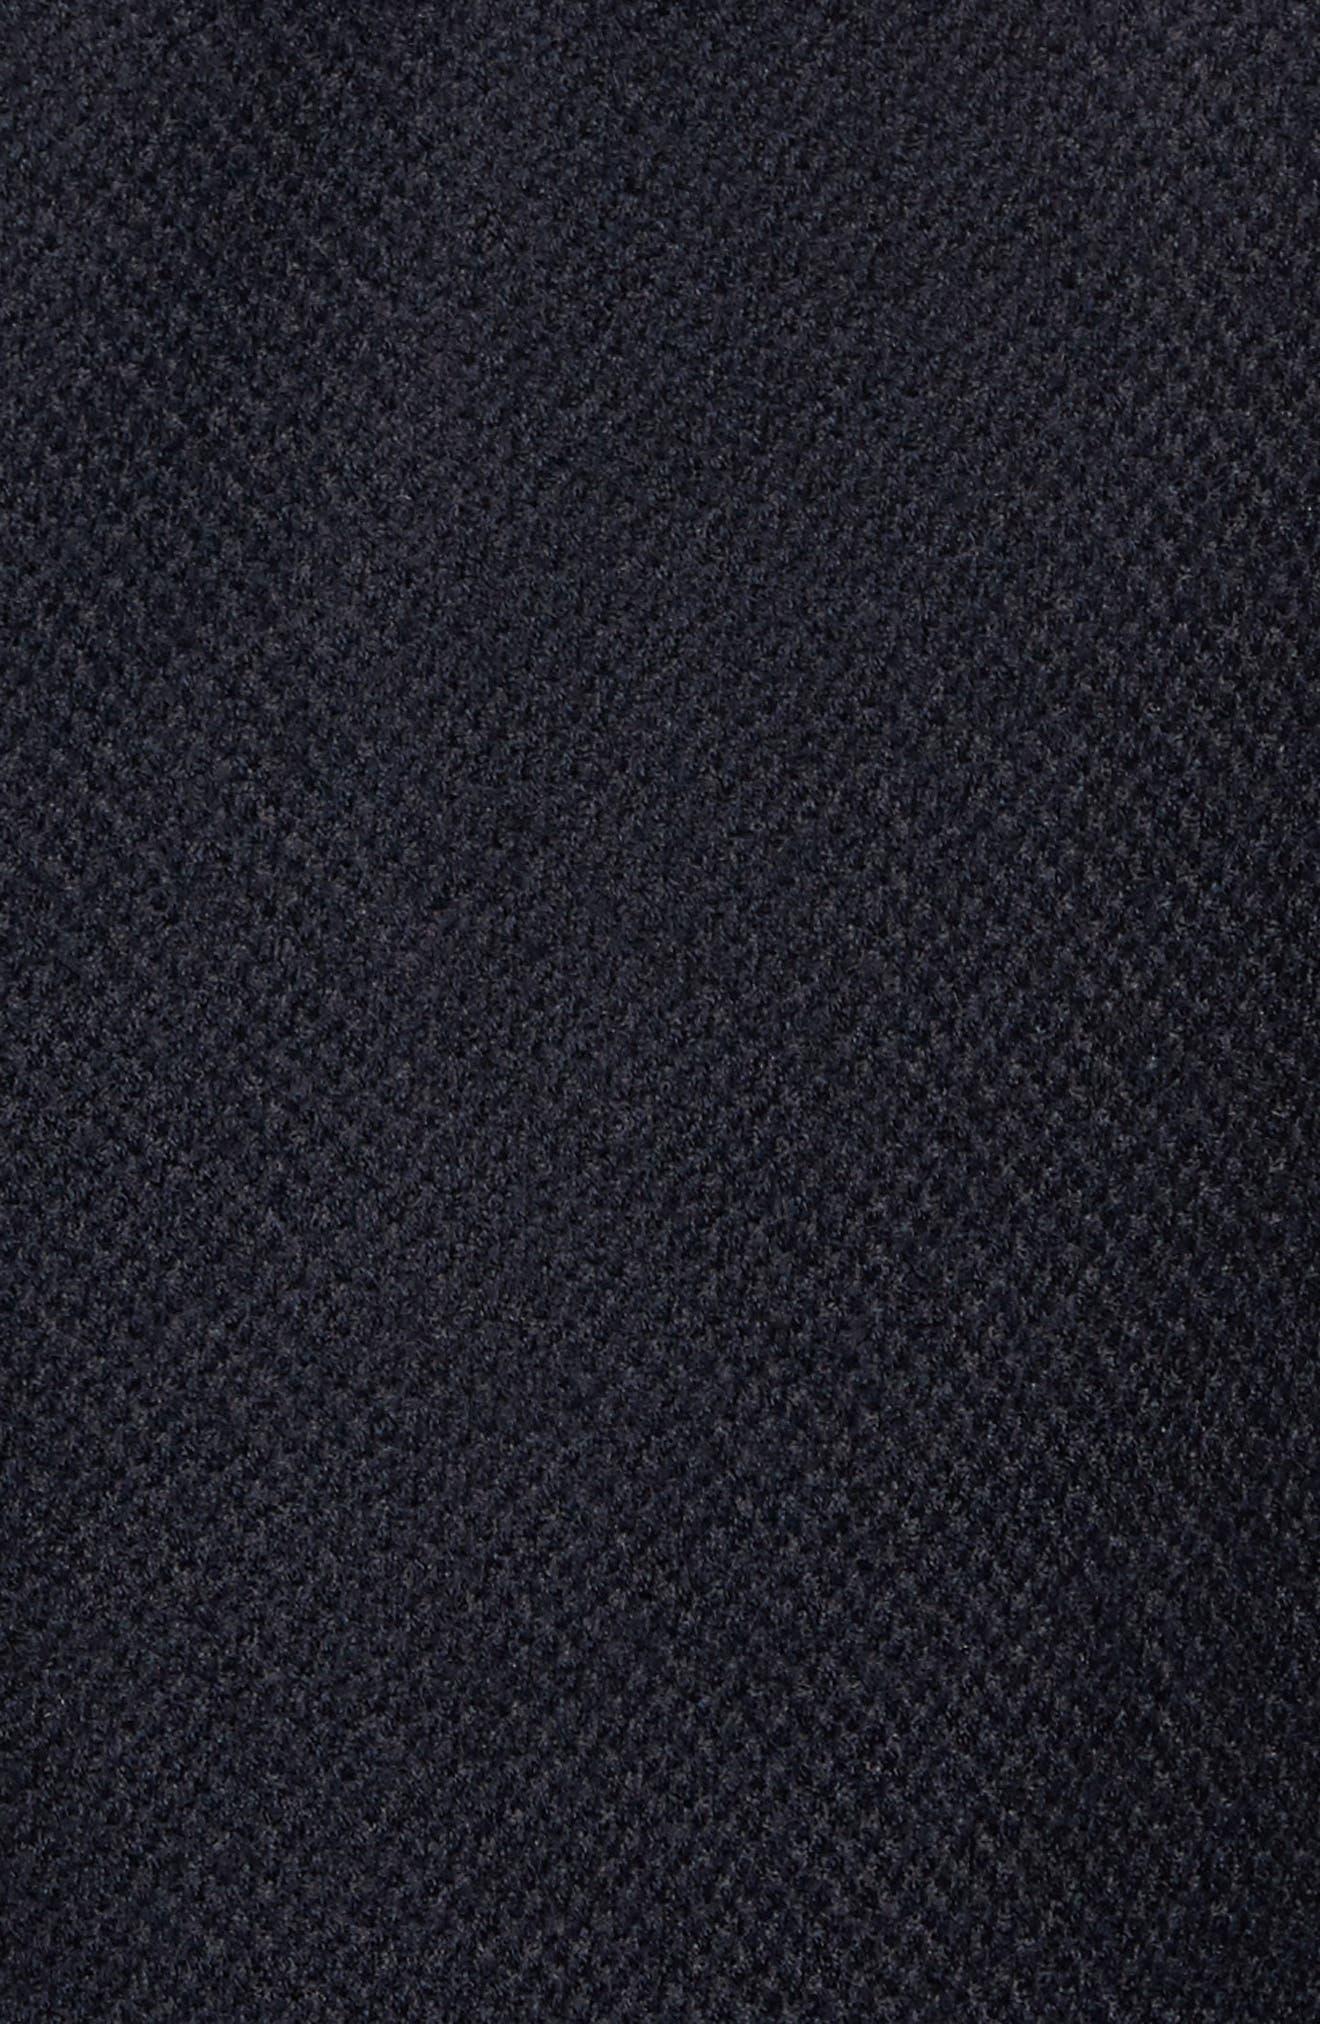 Ritchie Aim Hybrid Classic Fit Wool & Cashmere Sport Coat,                             Alternate thumbnail 5, color,                             Navy